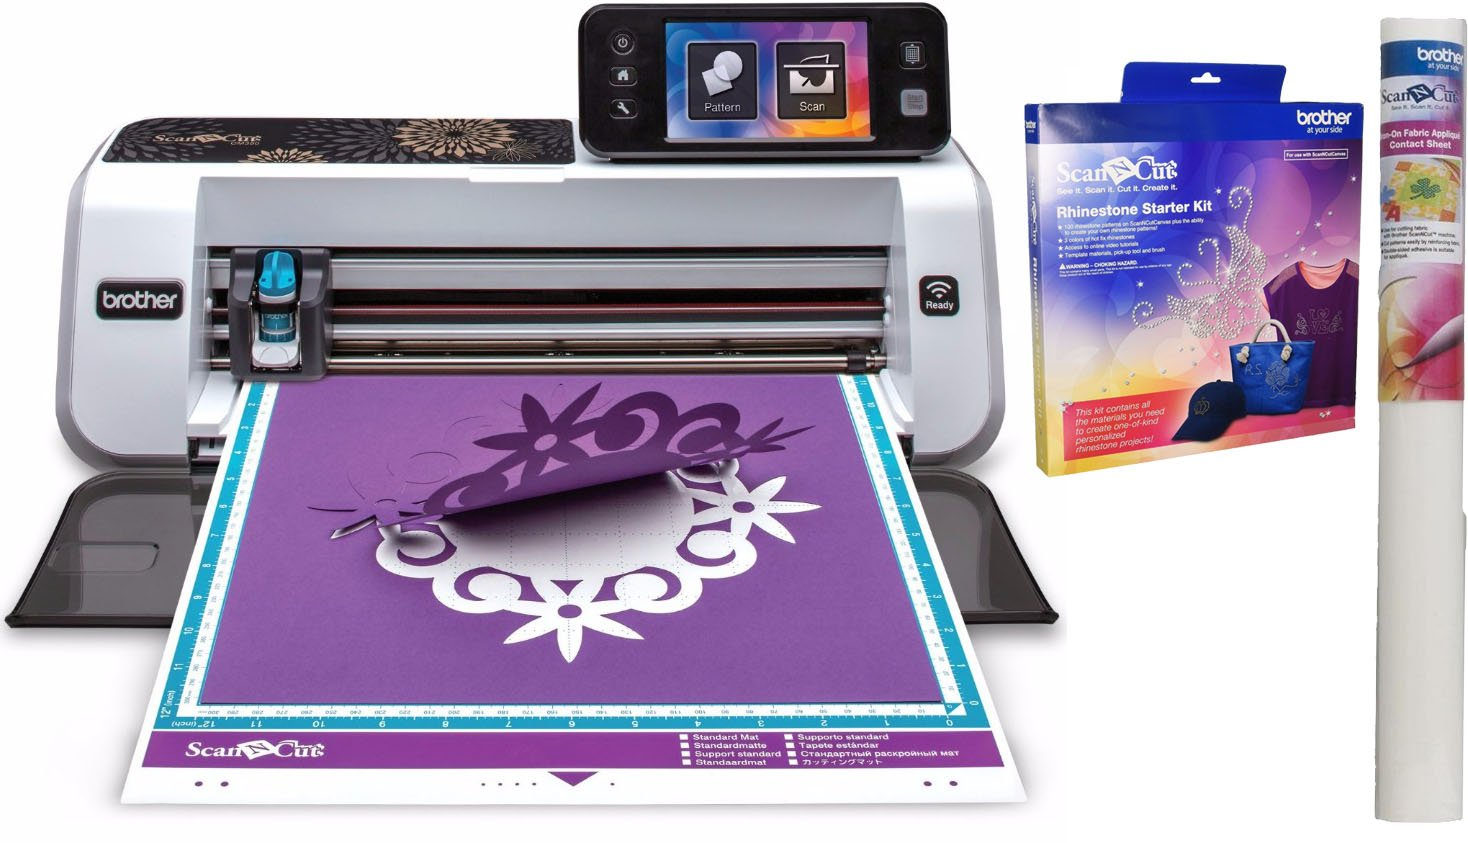 Brother ScanNCut2 CM350 Scanner & Cutting Machine Fabric Applique & Rhinestone Kit Bundle